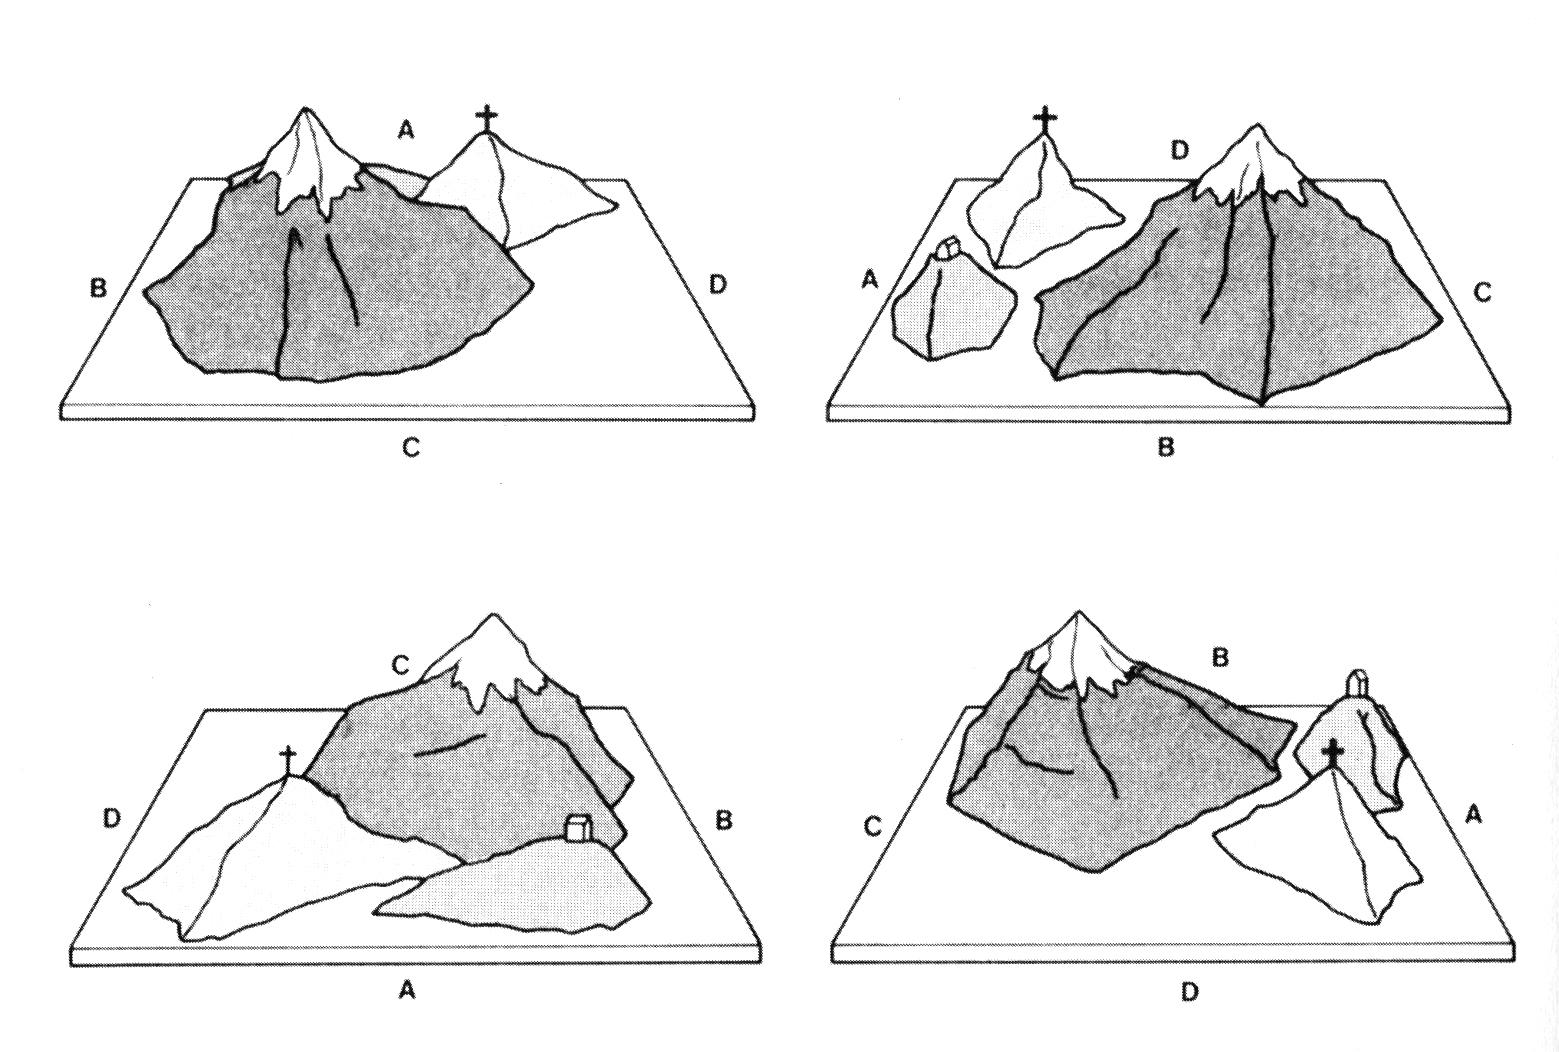 FJ Piaget III Mountain Task.jpg